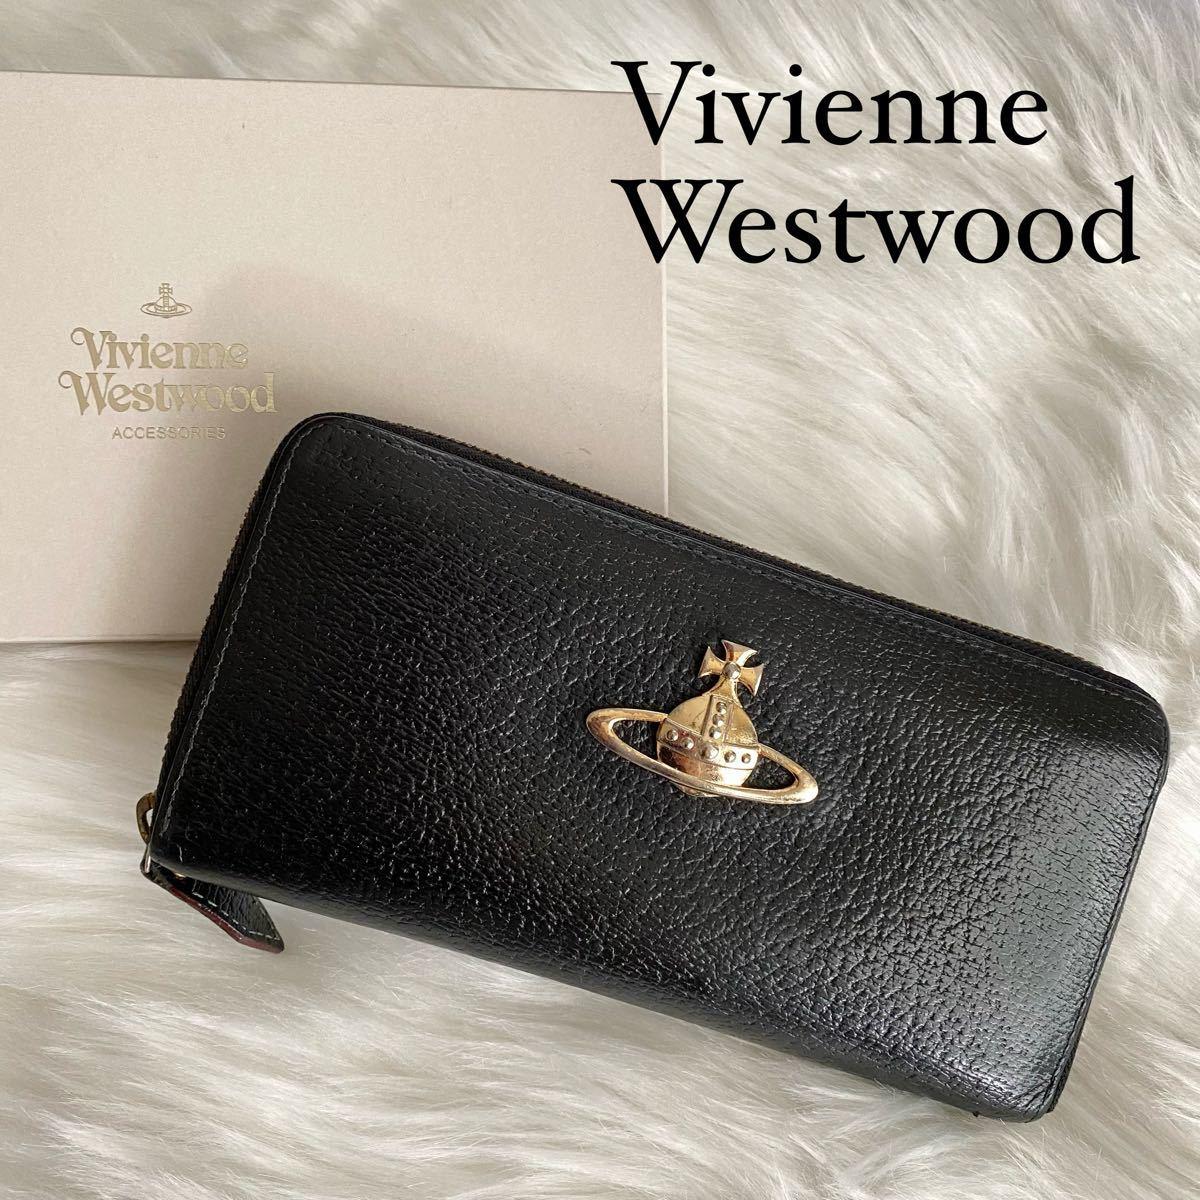 Vivienne Westwood ヴィヴィアンウエストウッド 長財布 ラウンドファスナー  オーブロゴ レザー 黒